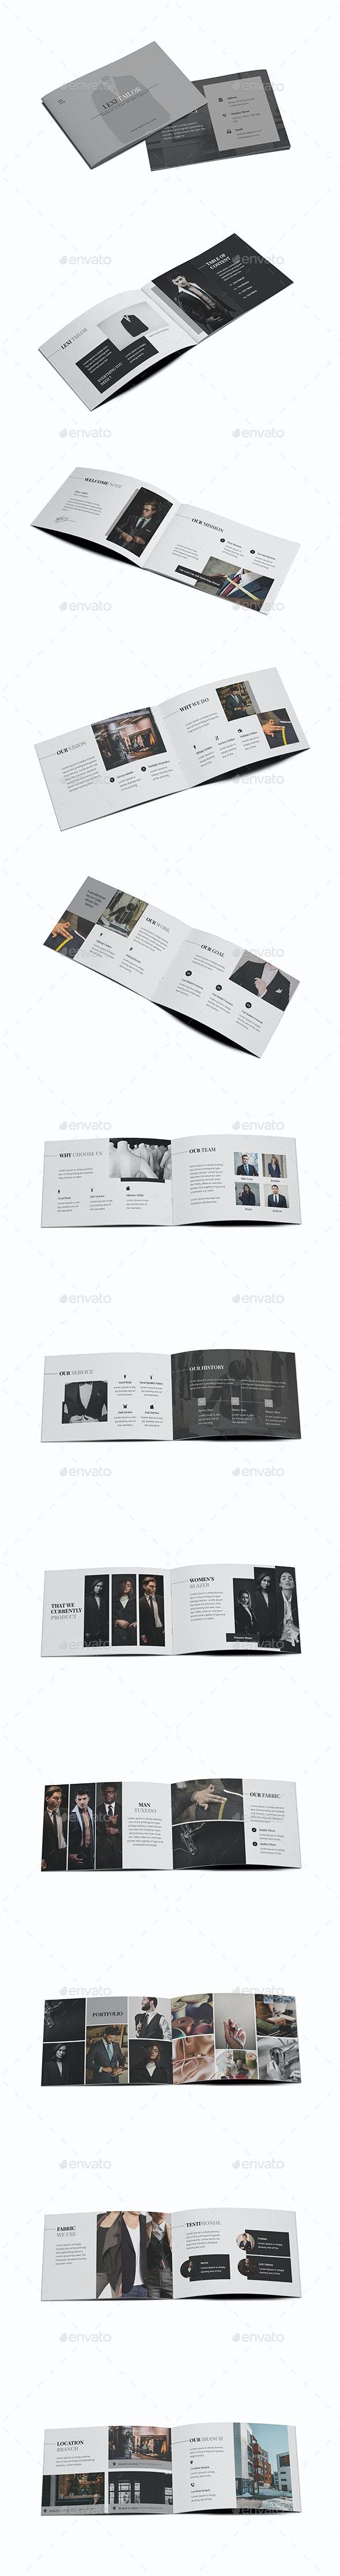 Custom Fashion Tailor A5 Brochure Template - Brochures Print Templates